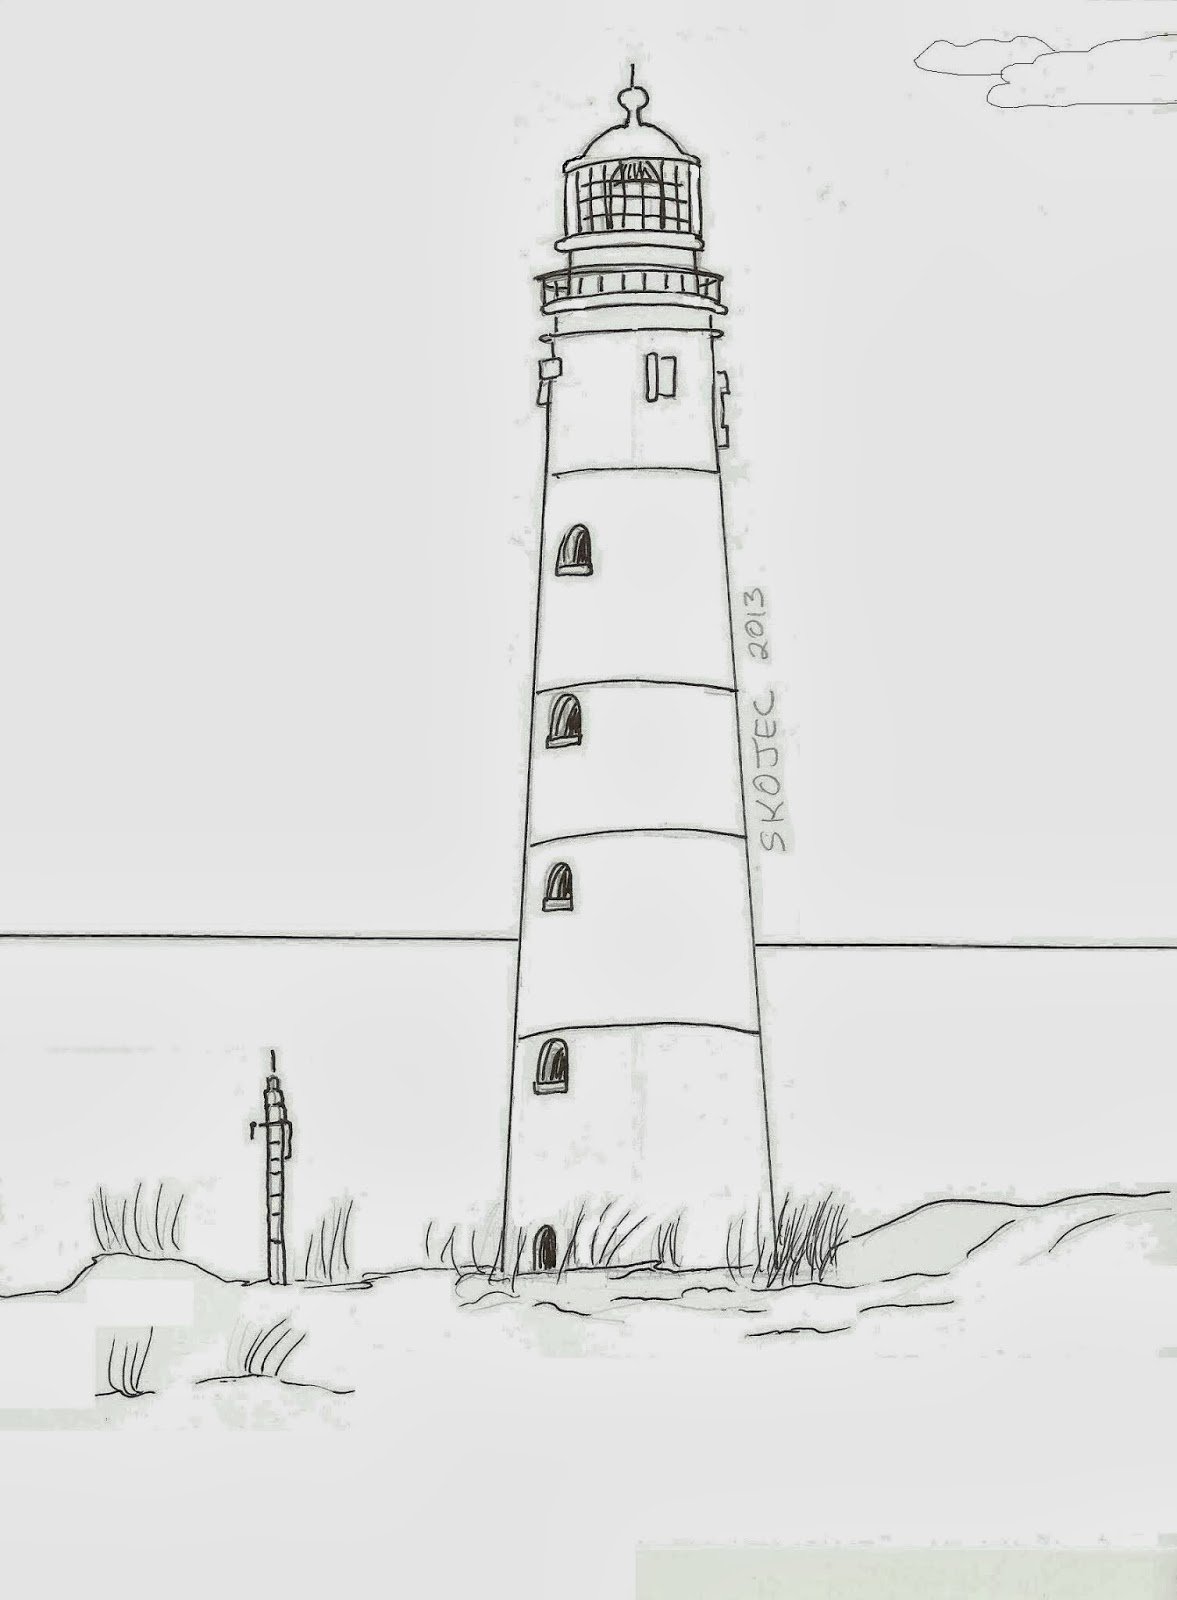 Drawn lighhouse line drawing Art Ideas a Draw a